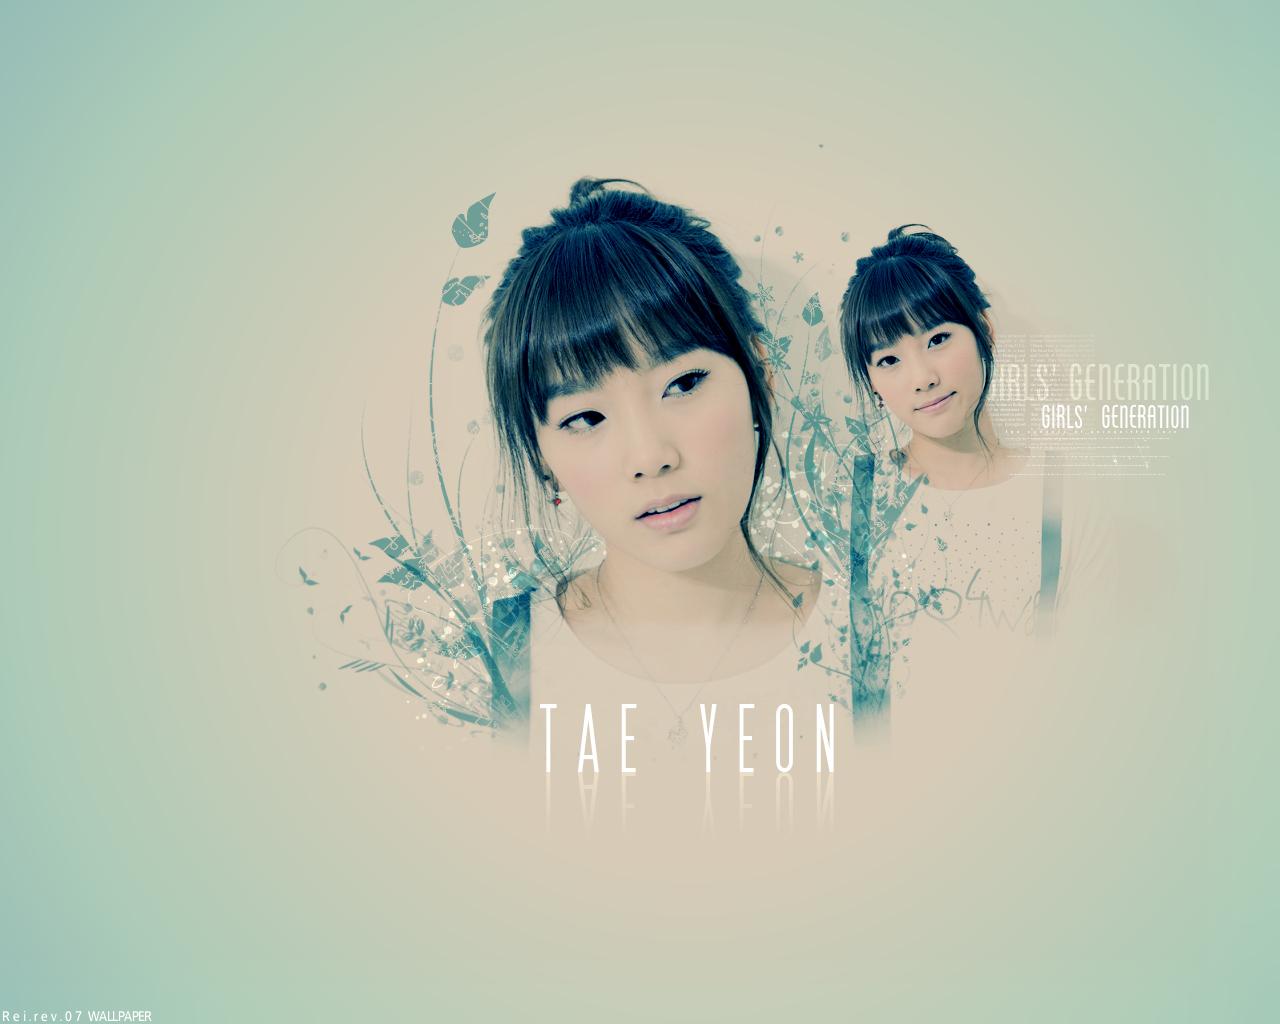 [PICS] Taeyeon Wallpaper Collection Taeyeon+Wallpaper-17